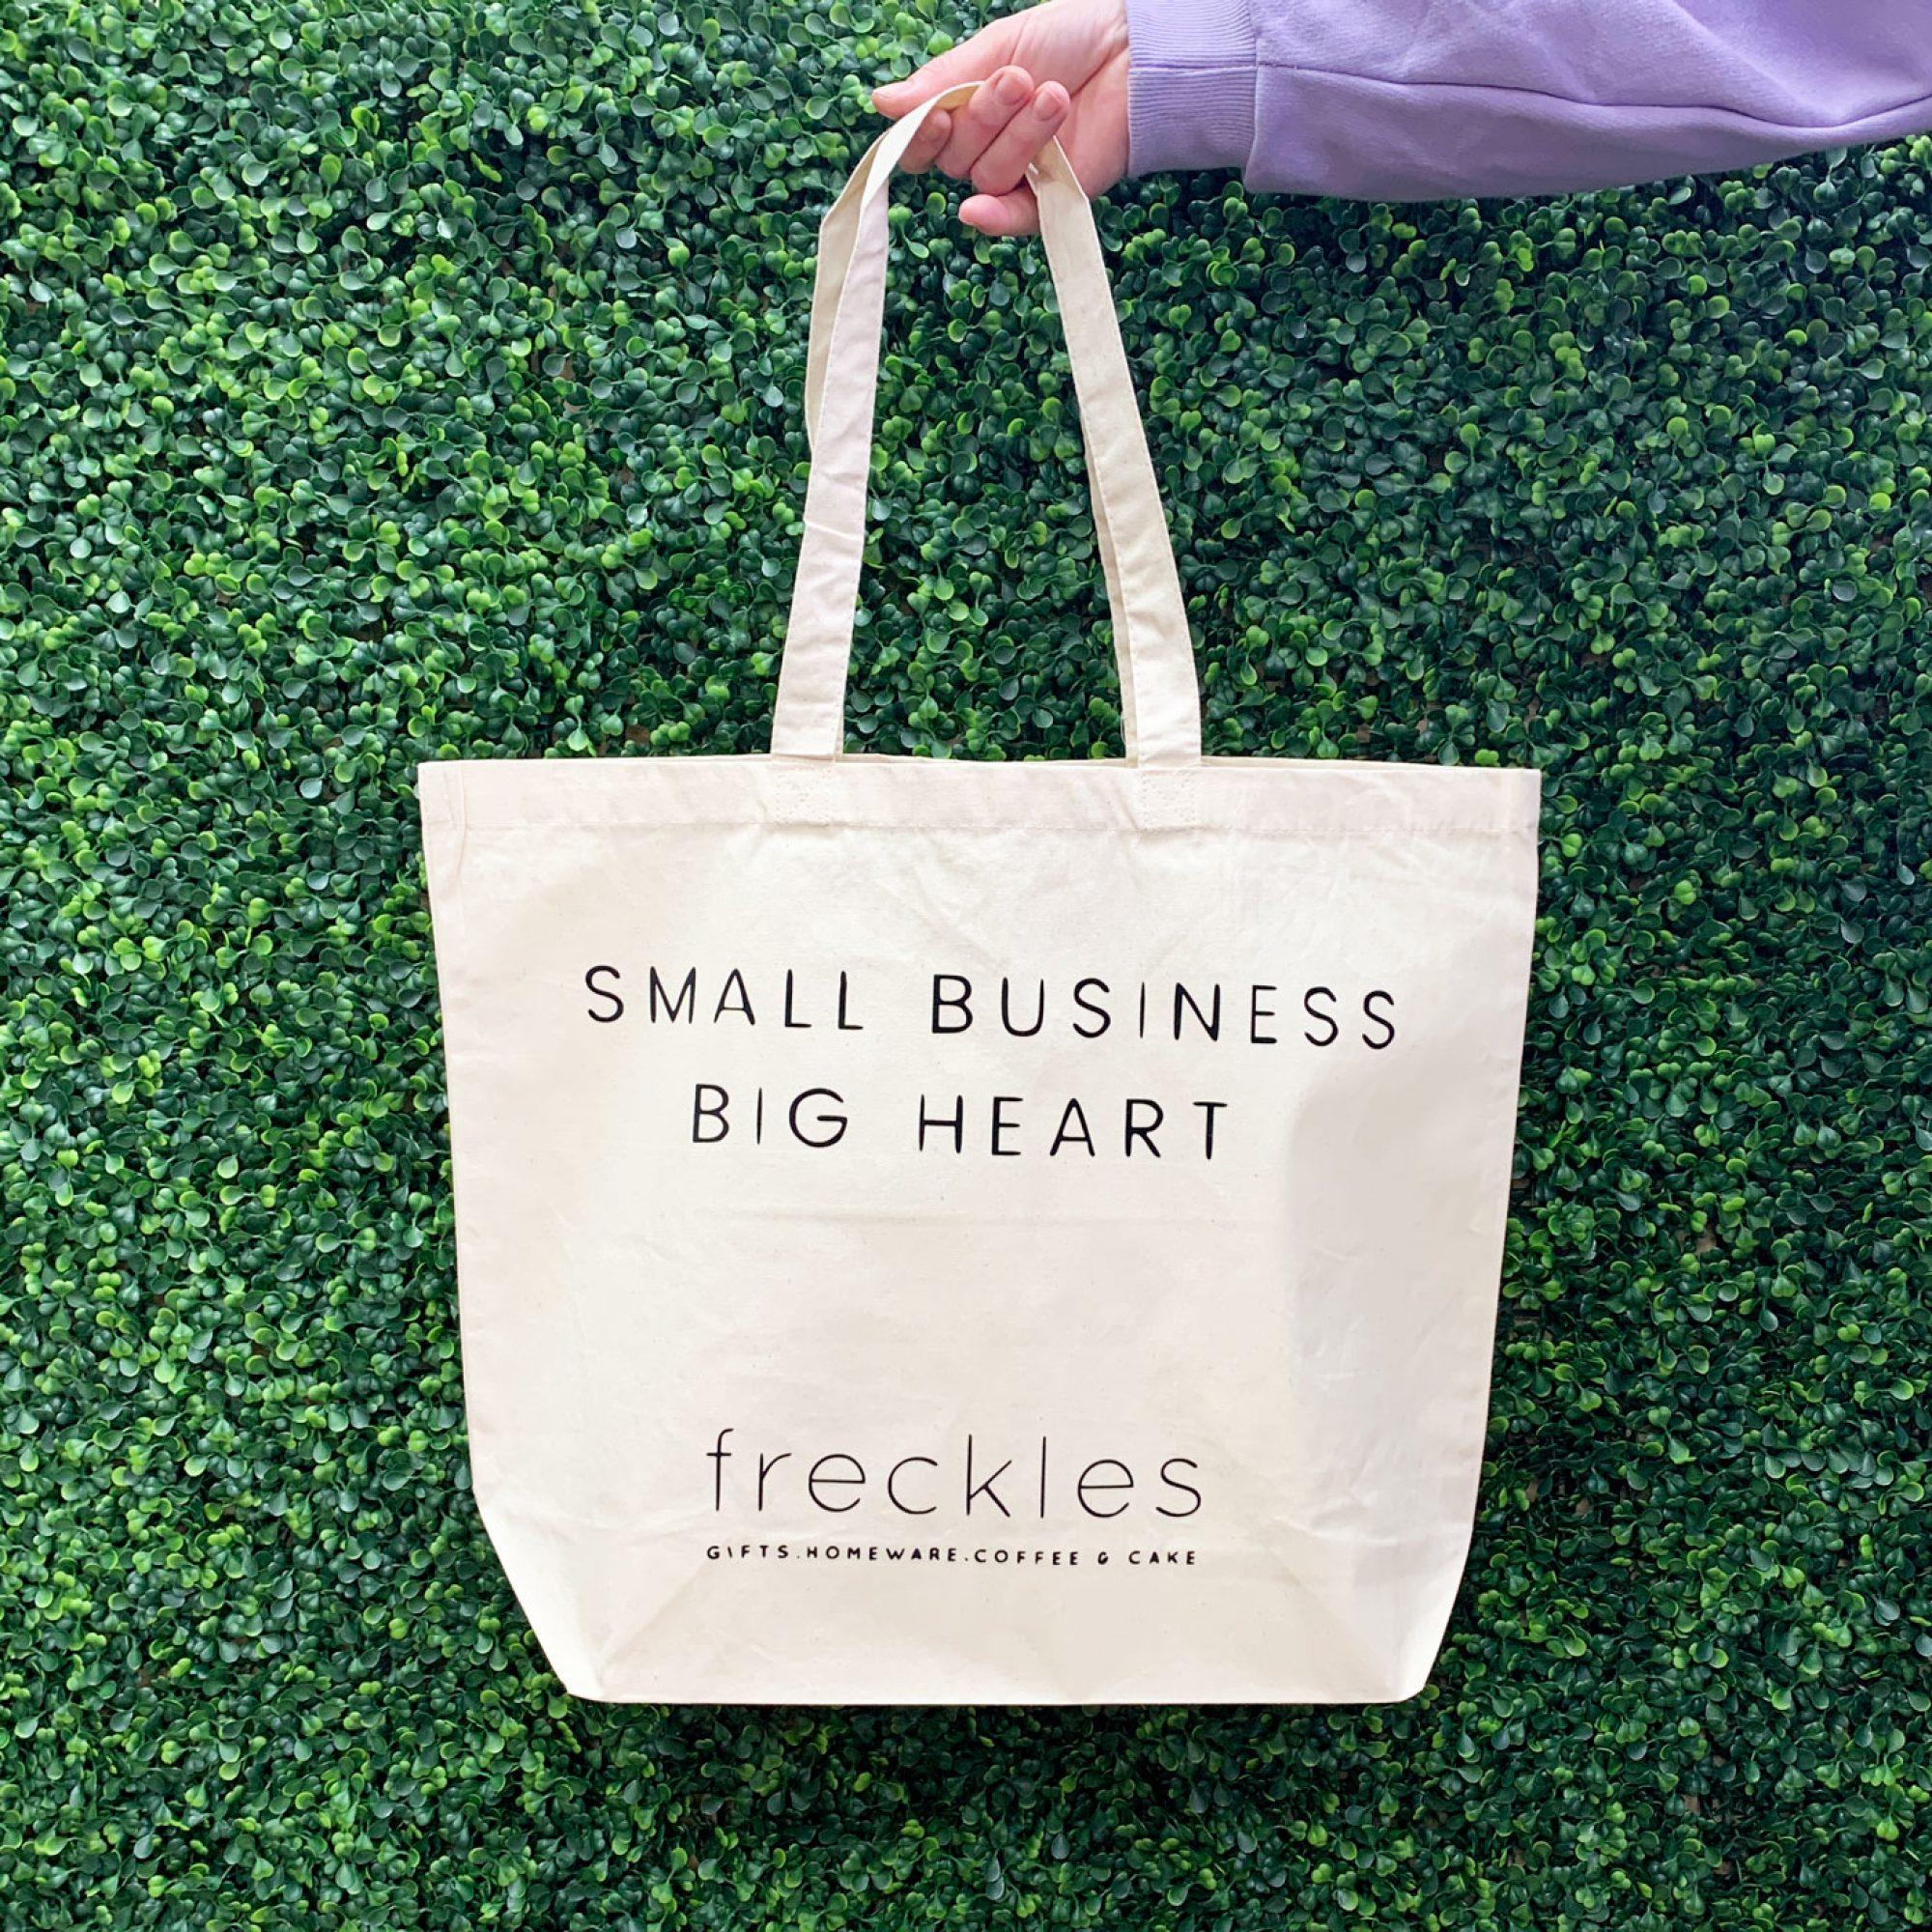 Small Business Big Heart Tote Bag